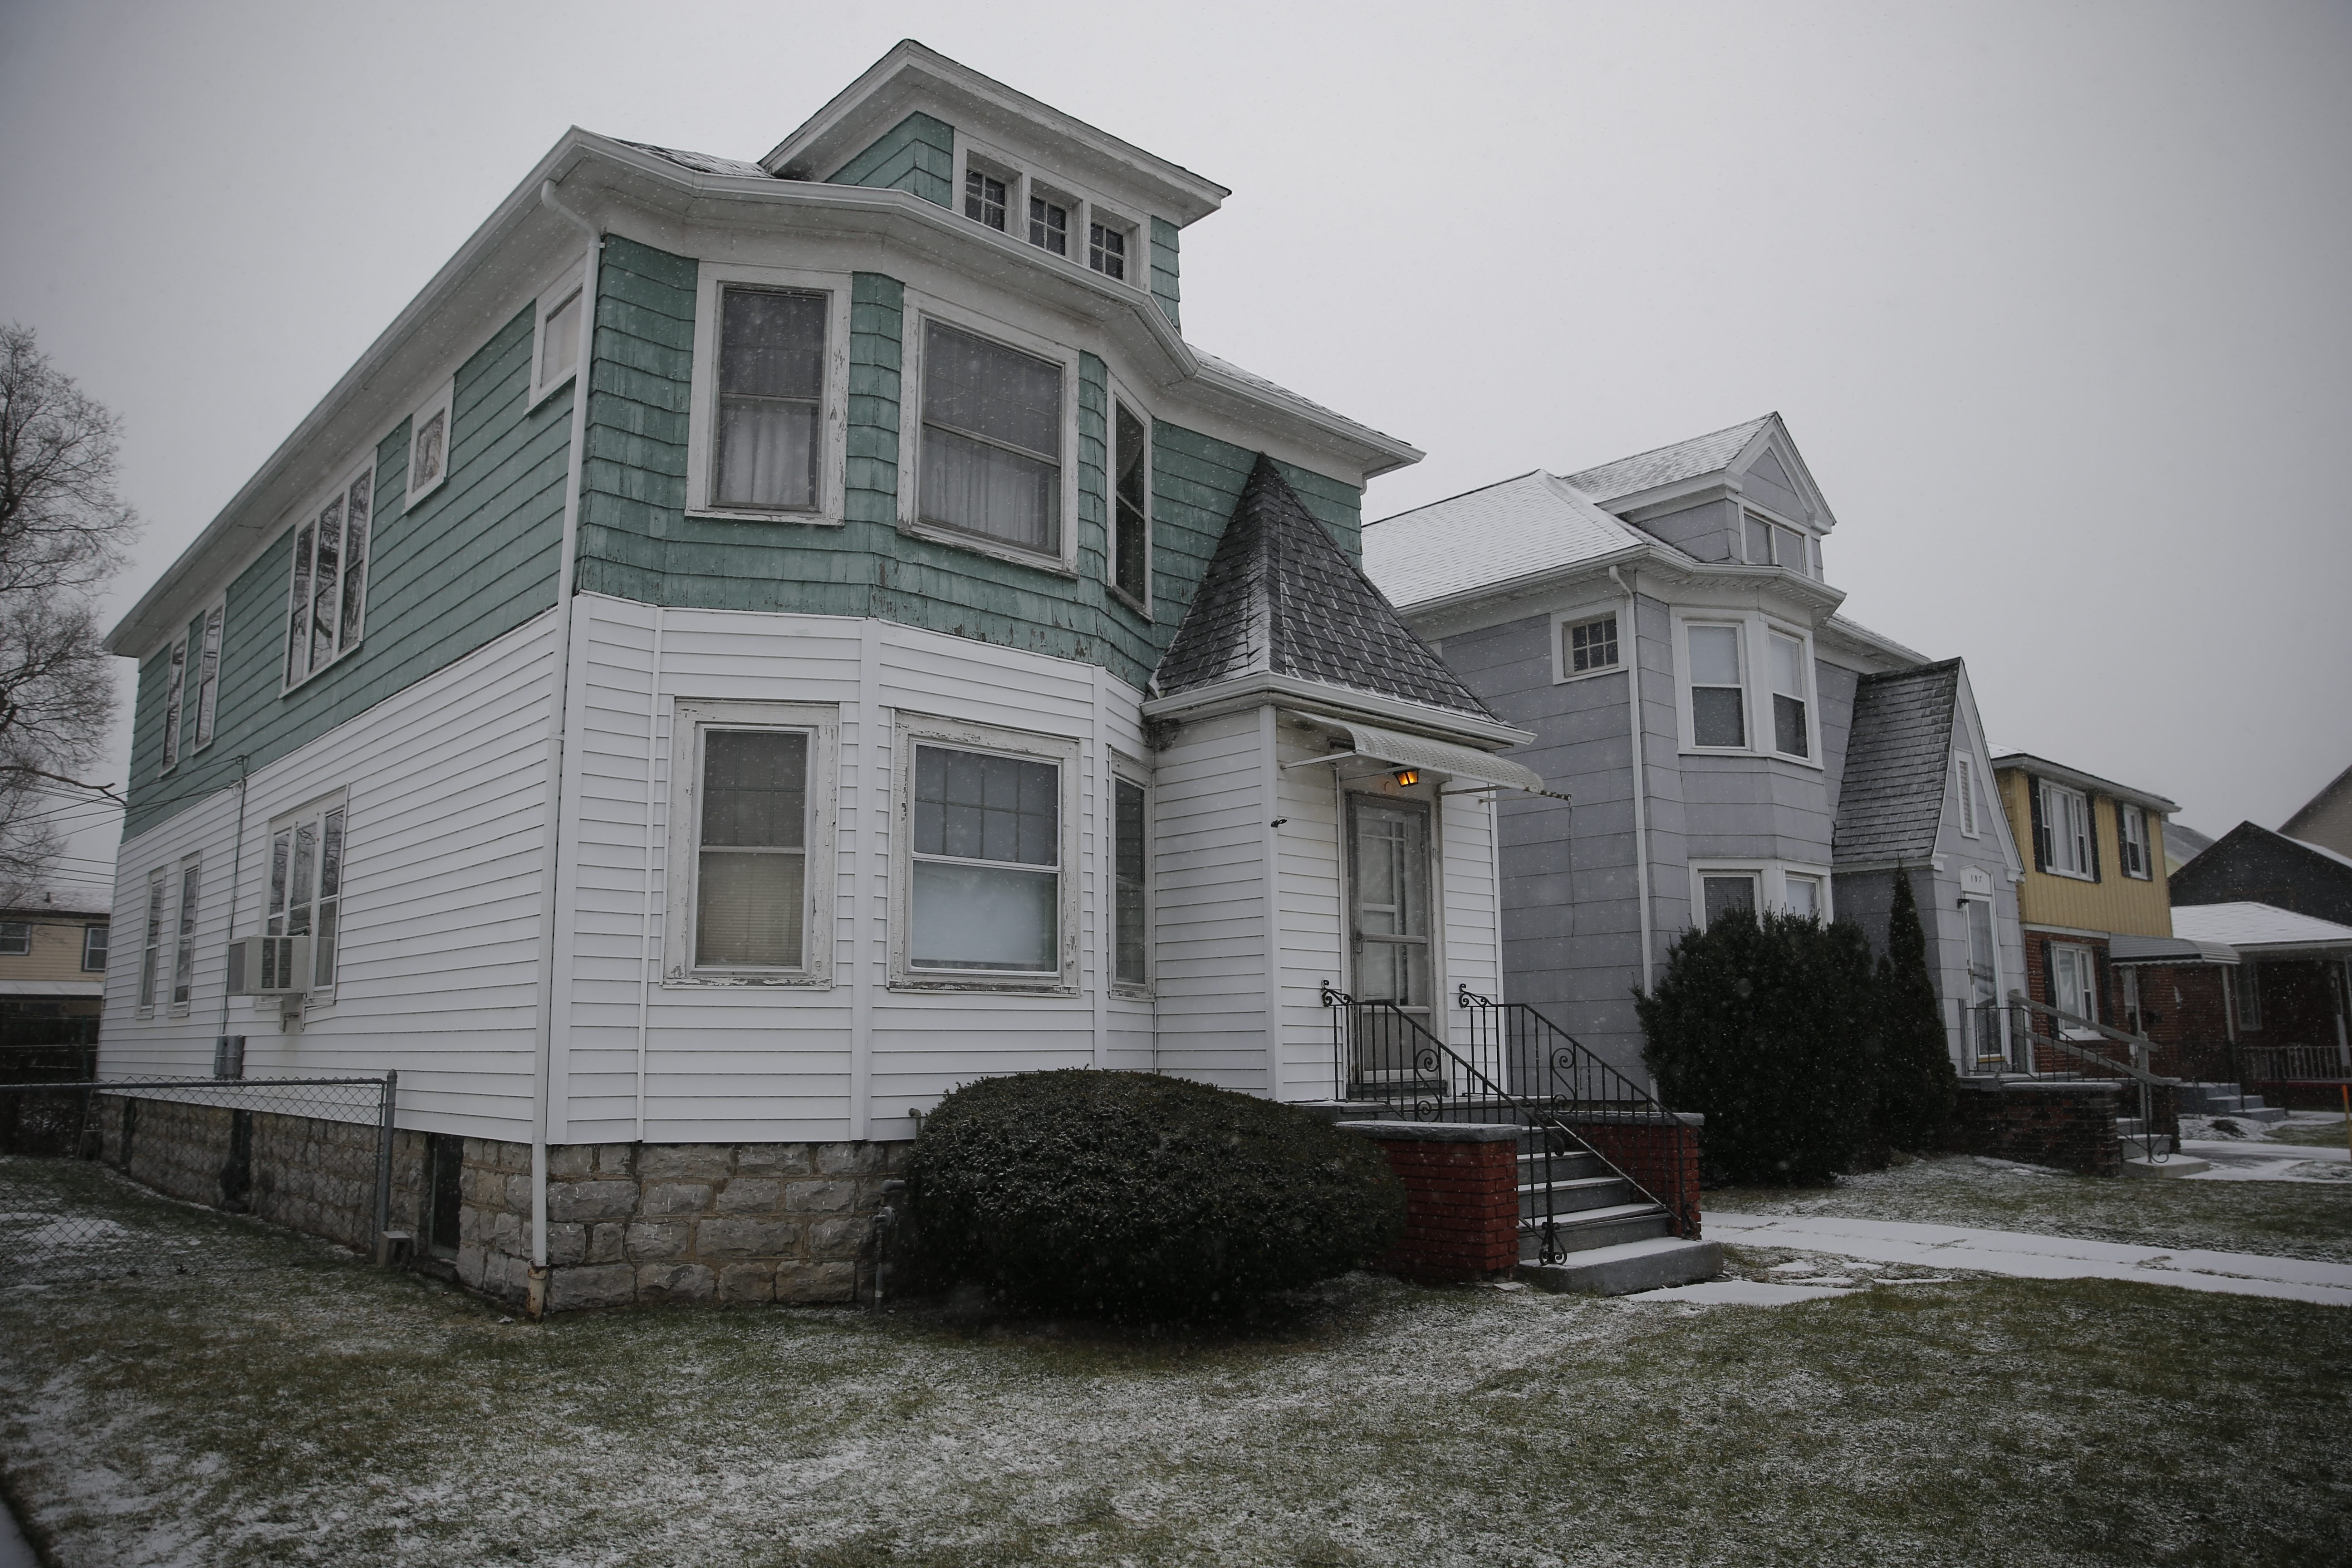 The Cunard Road home in North Buffalo, Thursday, Jan. 28, 2016, where a woman was found dead.  (Derek Gee/Buffalo News)